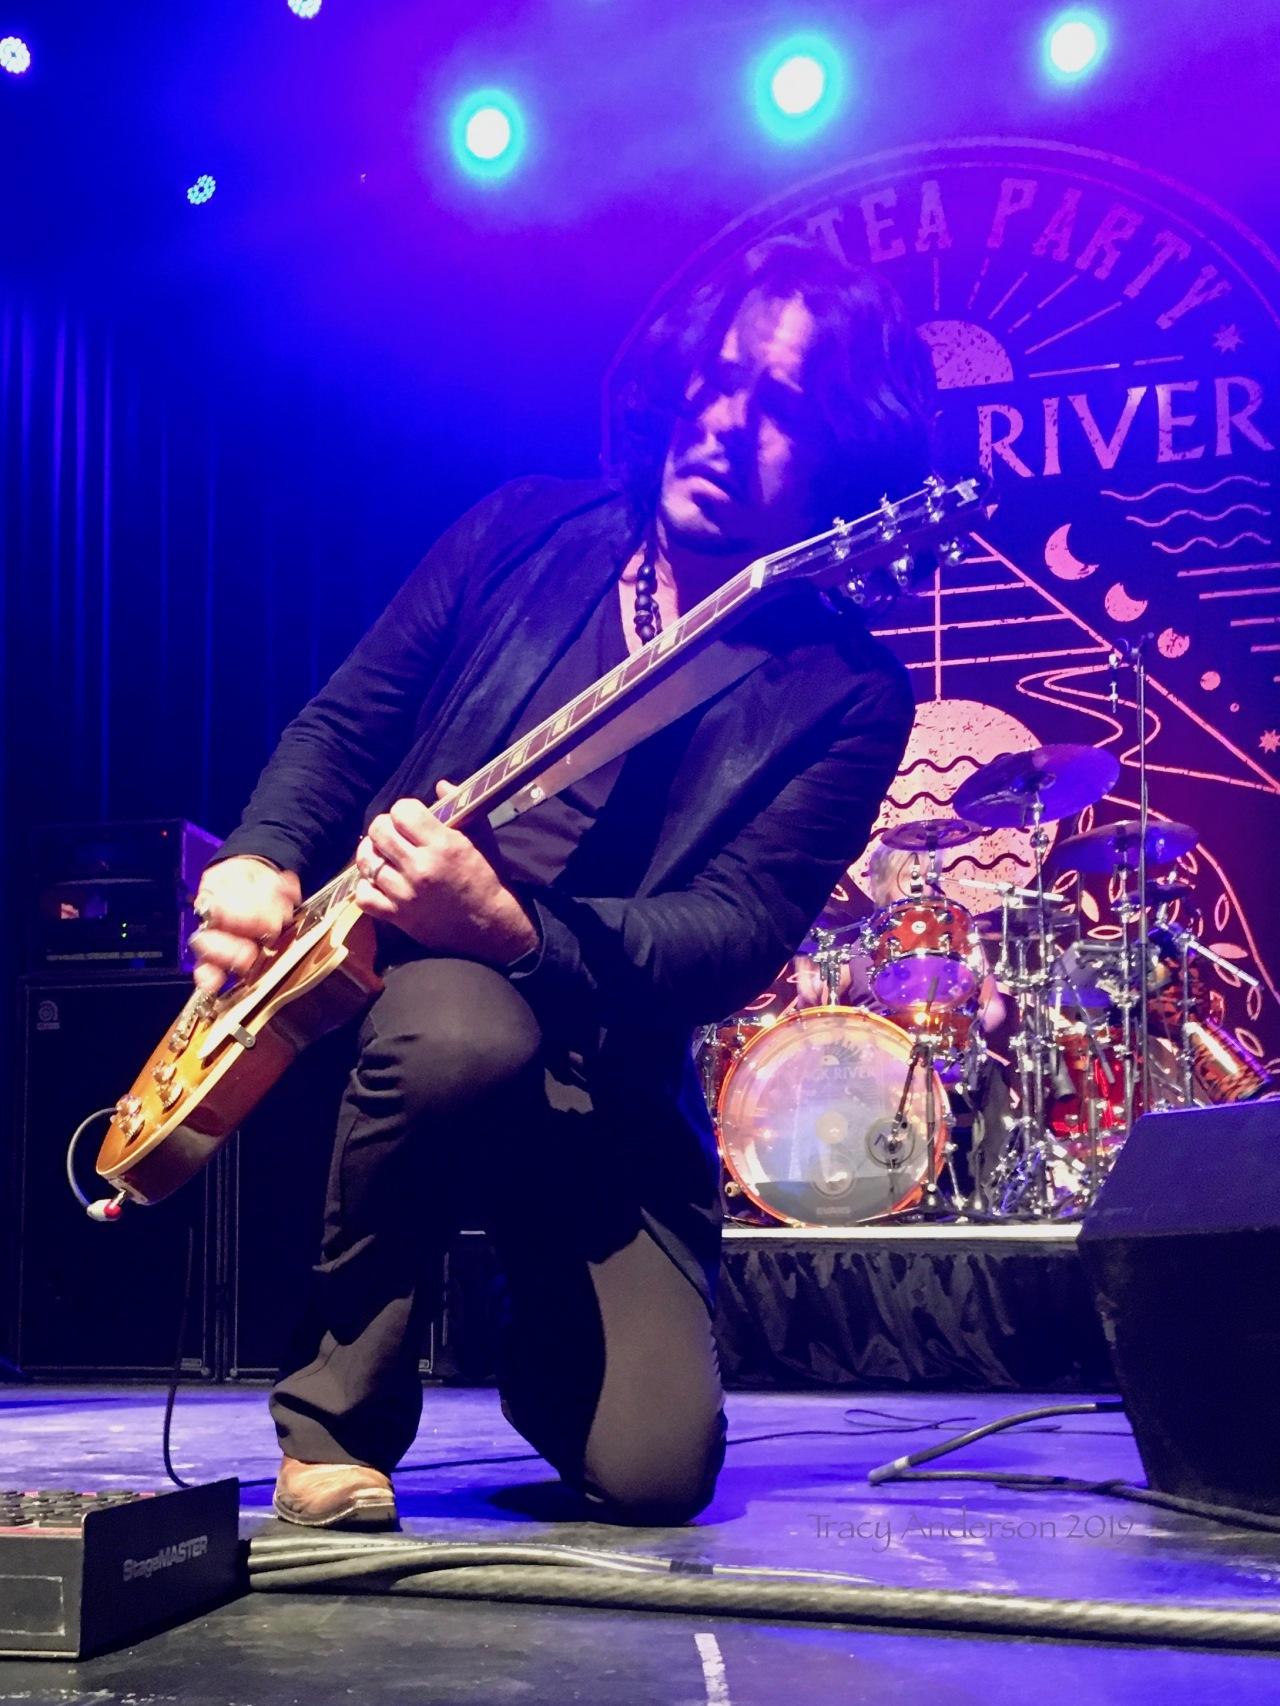 Jeff Martin The Tea Party Black River Tour May 4 2019